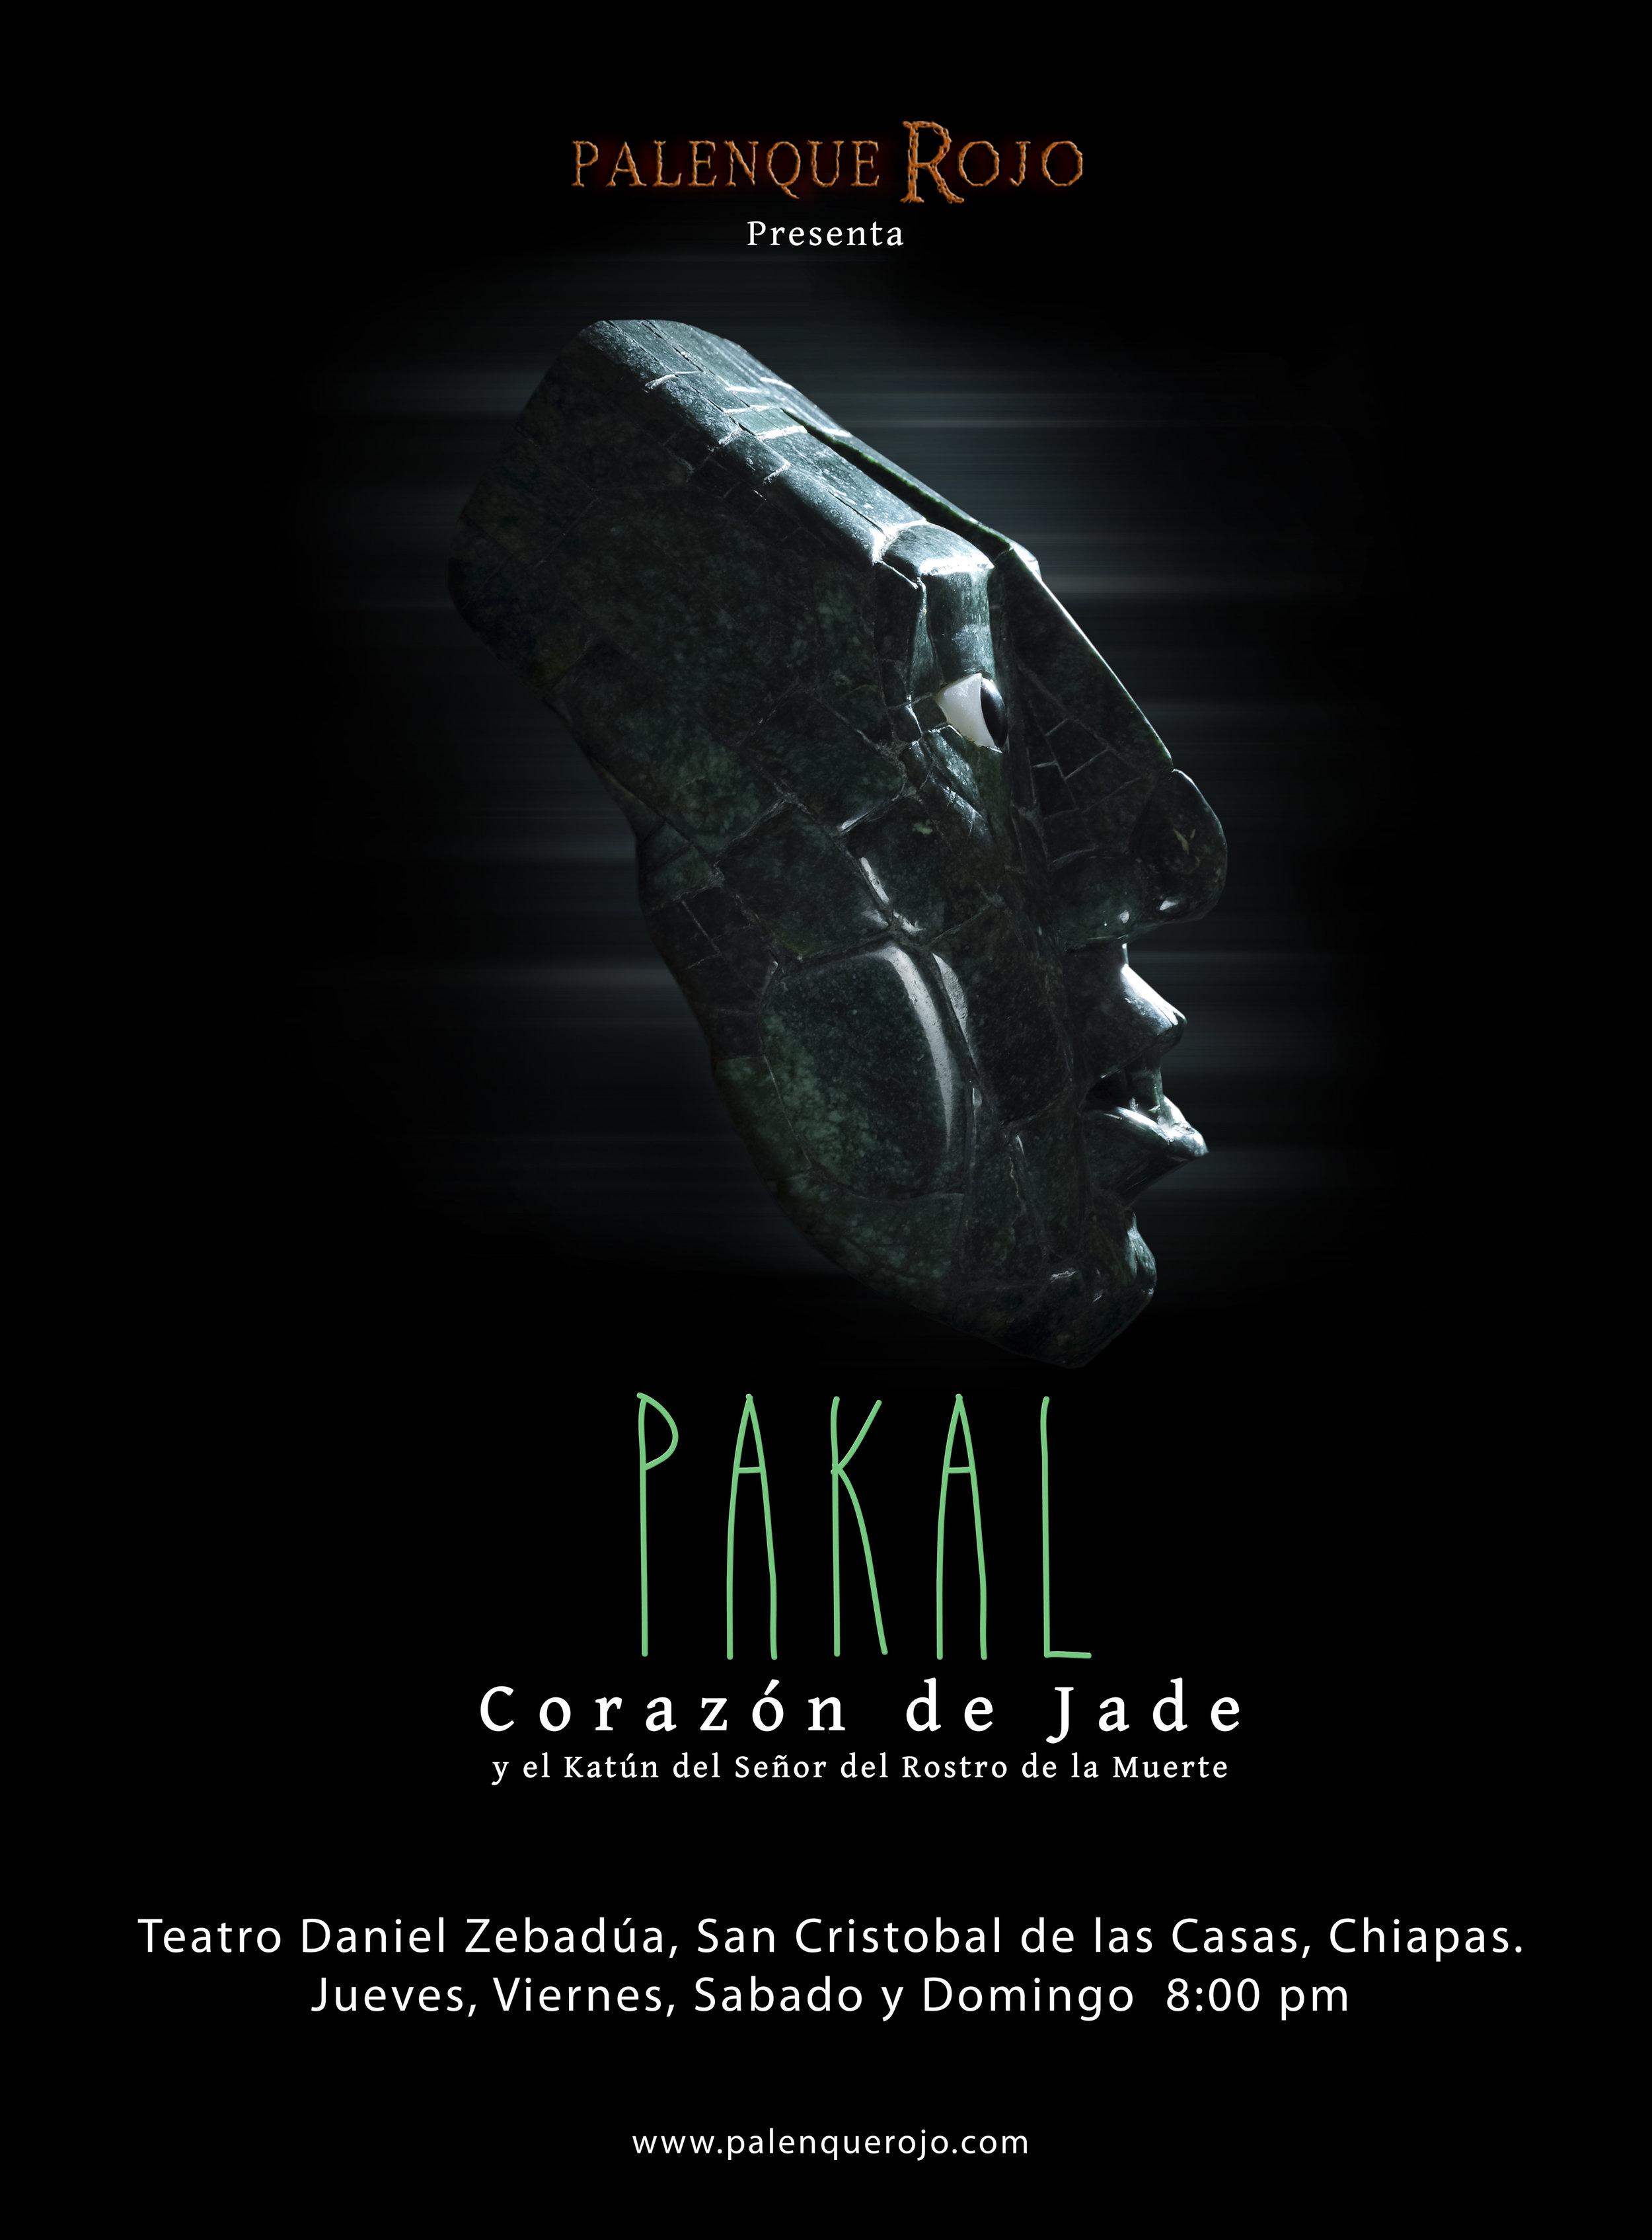 Corazon de Jade. Premiered in December of 2013 in El Teatro Zabadua, San Cristobal de Las Casas, Chiapas.  Direction, production and script by Hiram Marina.   https://www.youtube.com/watch?v=UDRRLOTPxOo